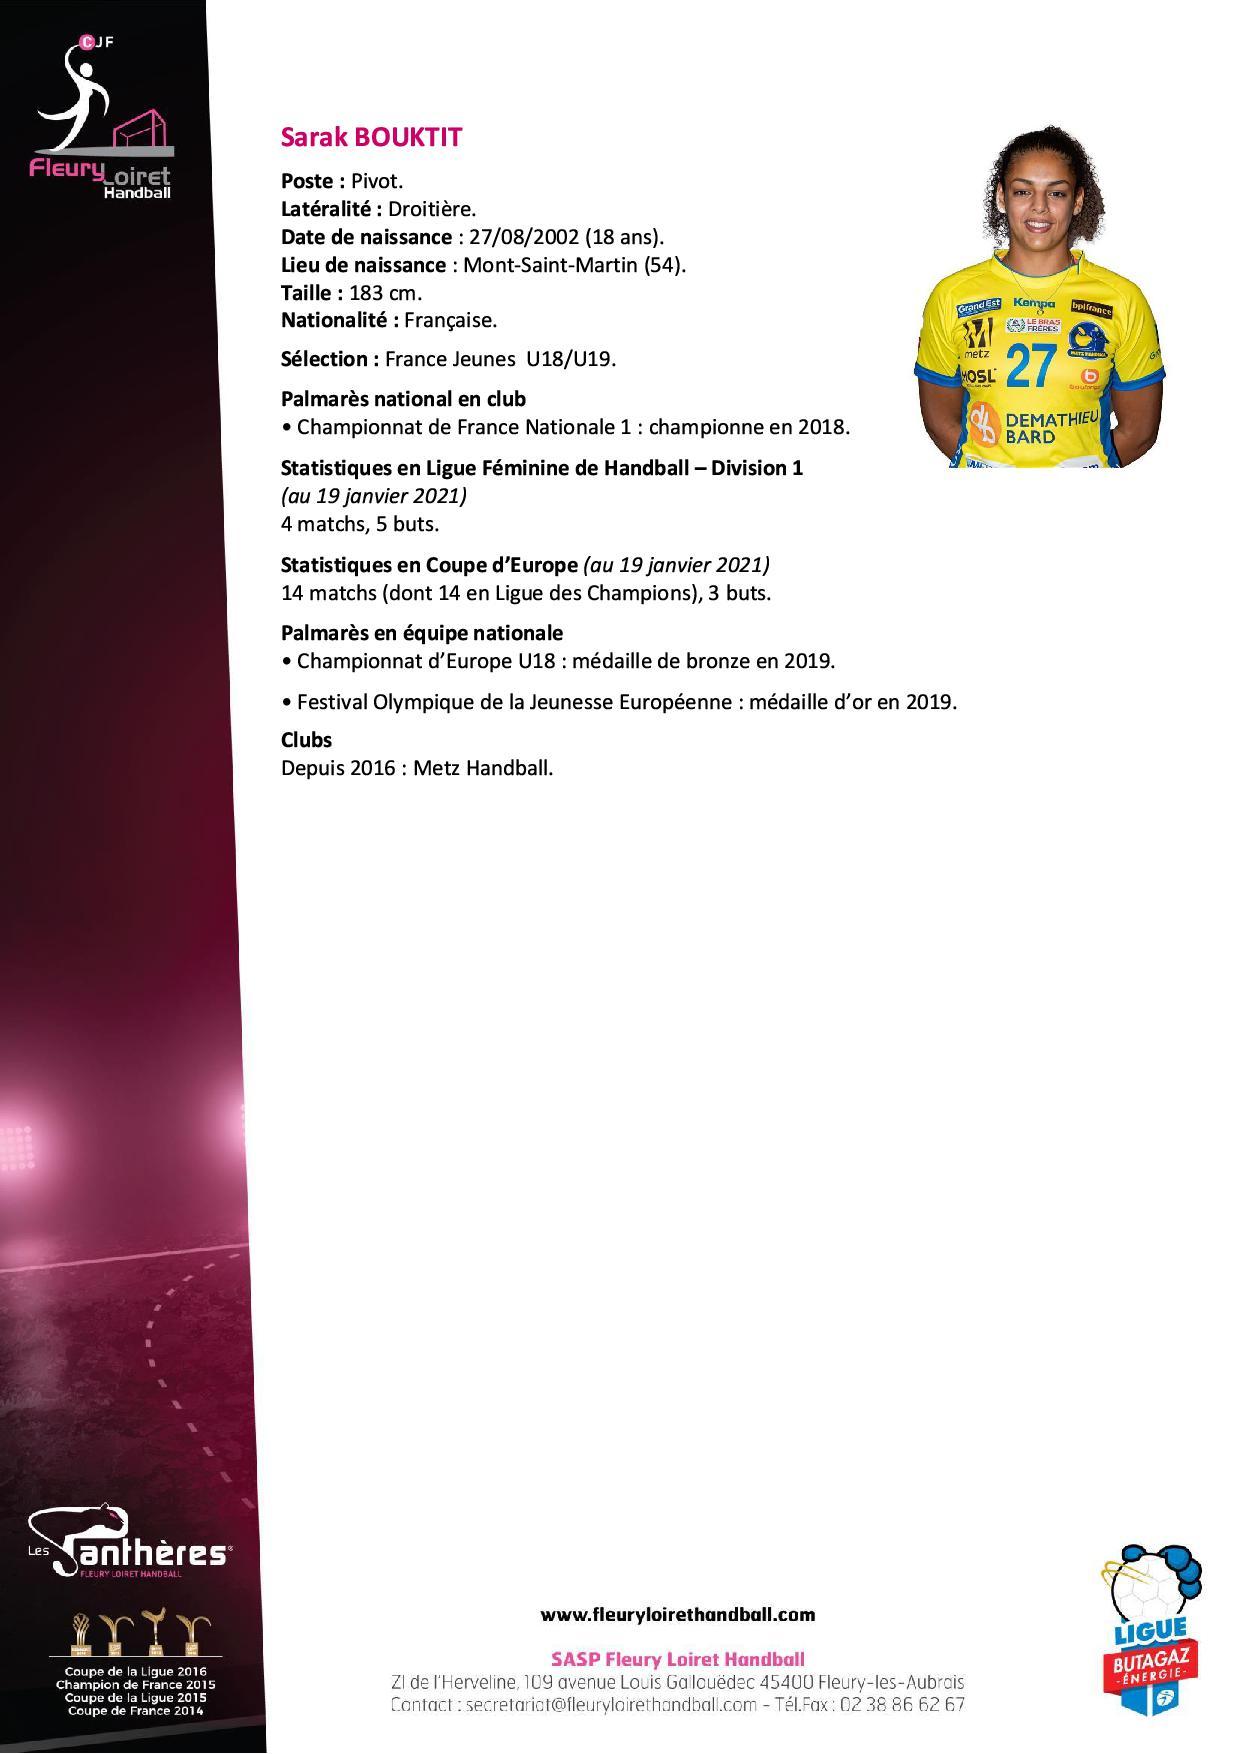 Communiqué Fleury Loiret Handball - Mercredi 20 janvier 2021 N° 22.jpg